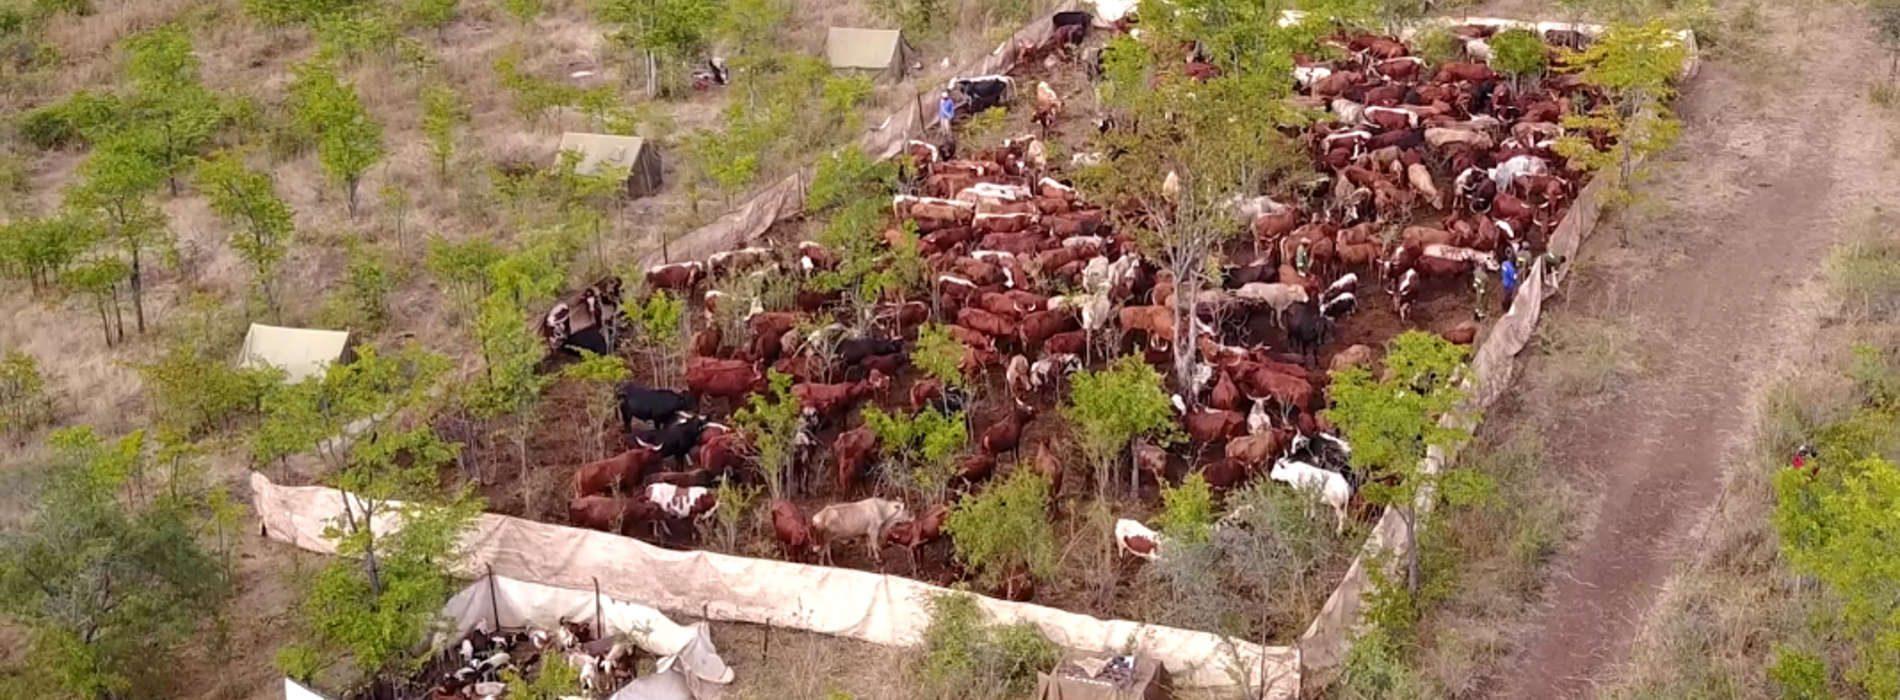 A quiet agricultural revolution